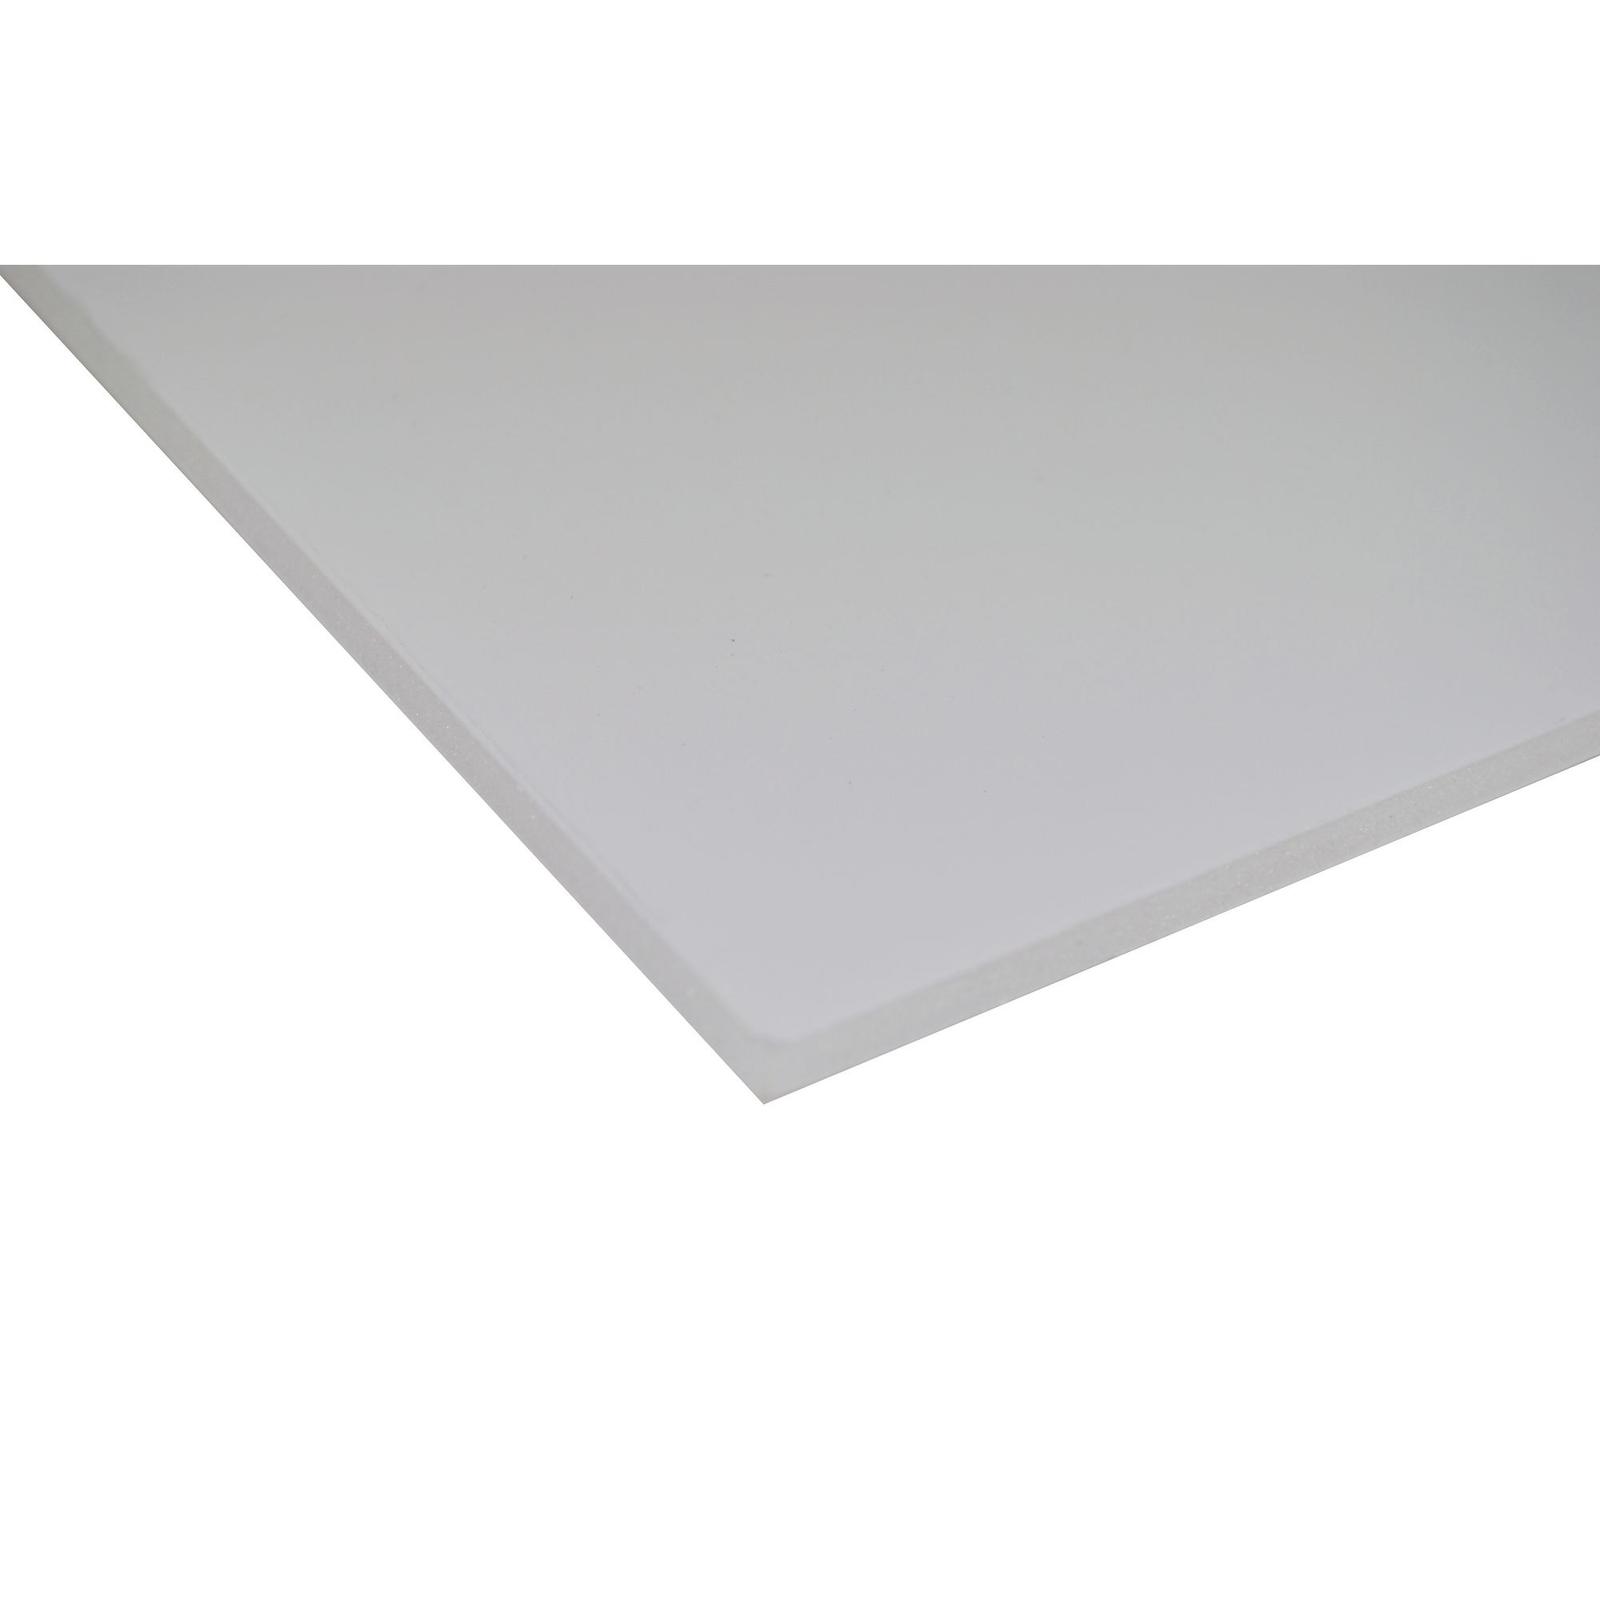 Foam Board - A4 White